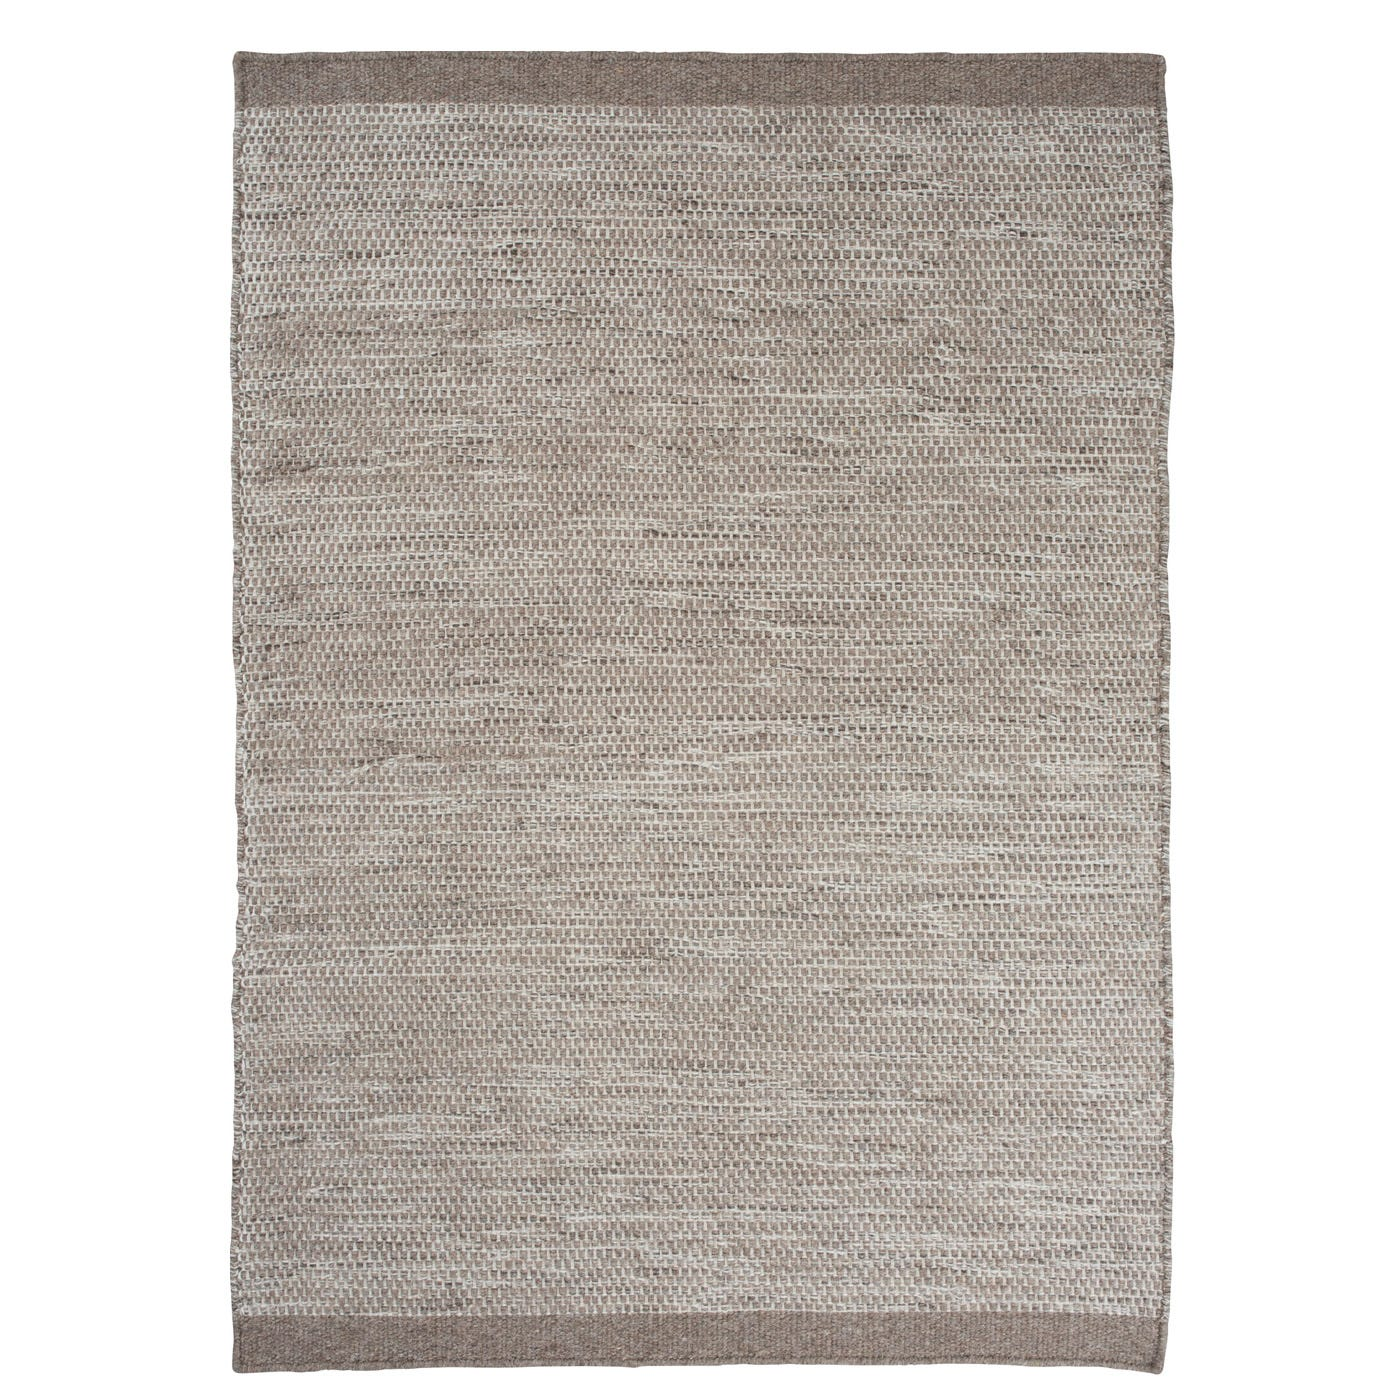 Asko Rug Light Grey & Natural